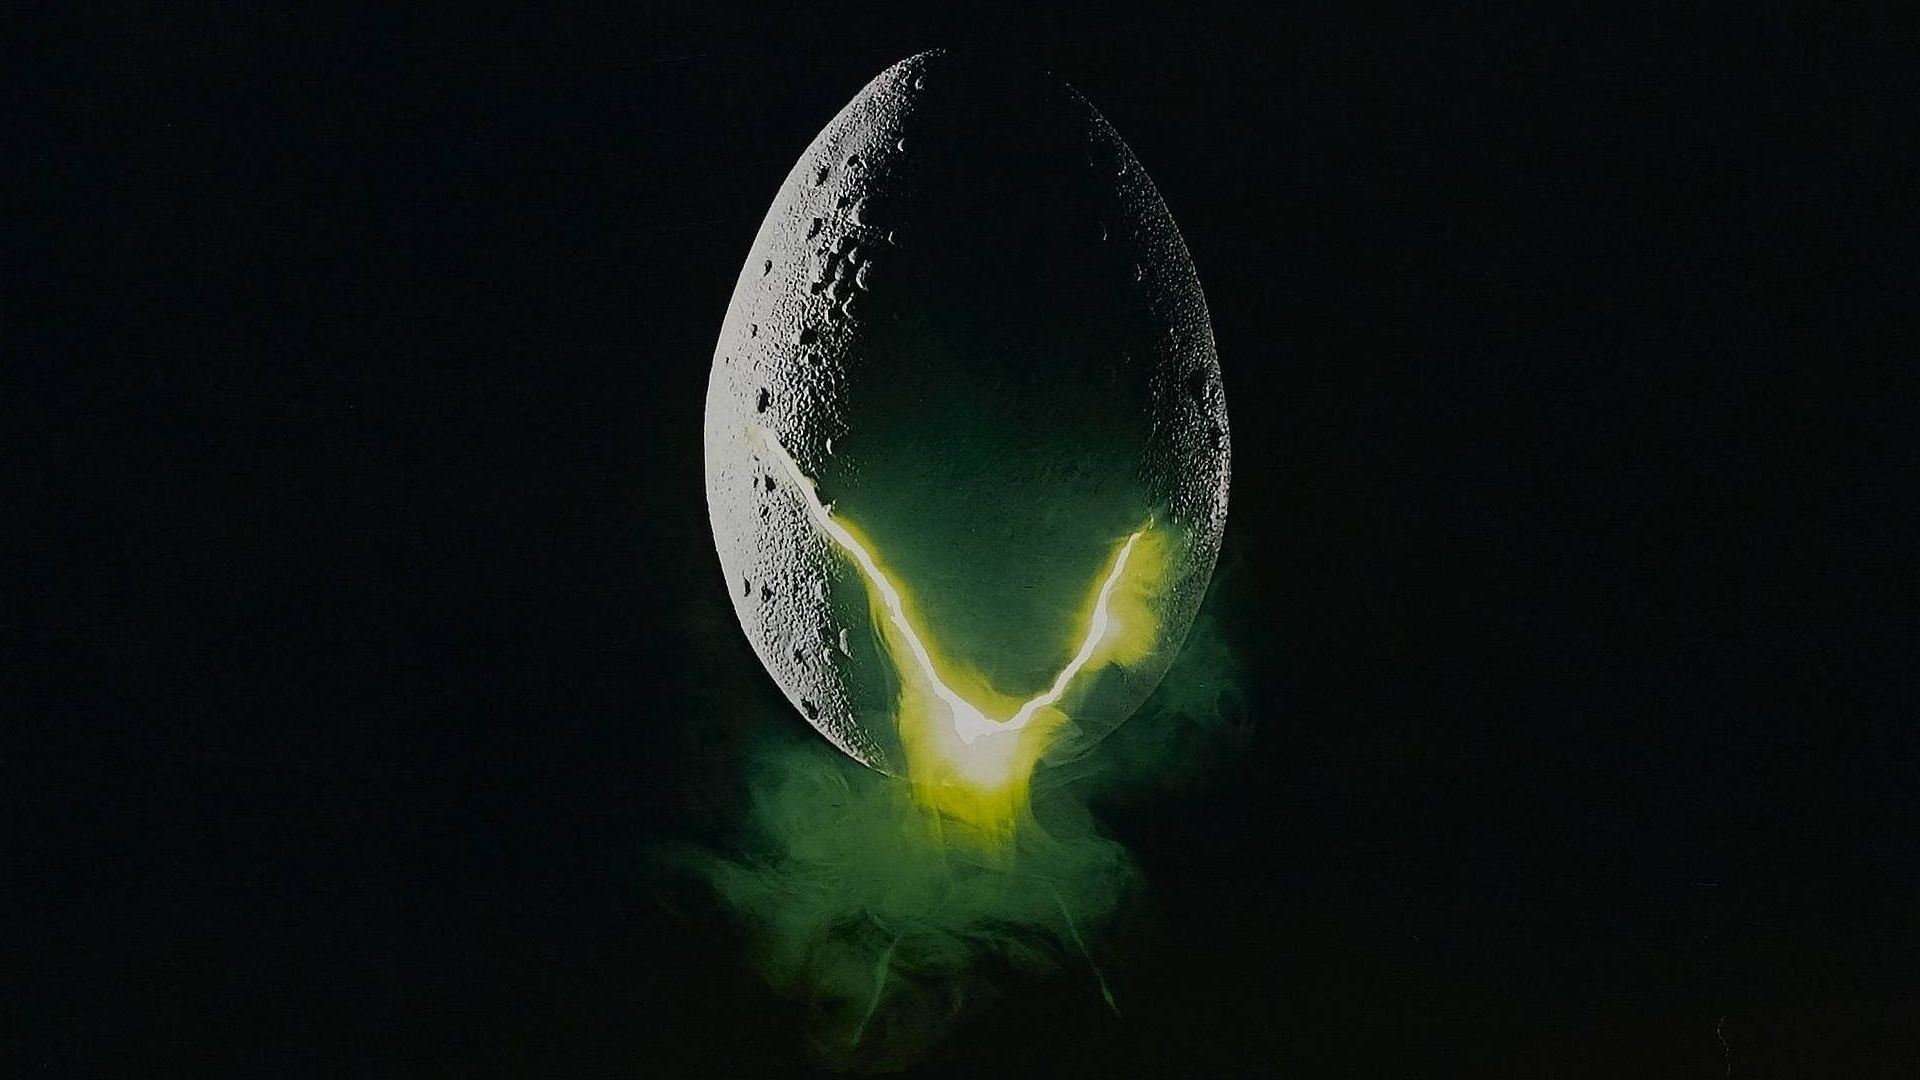 Res: 1920x1080, Aliens desktop wallpaper - A classic movie from Ridley Scott